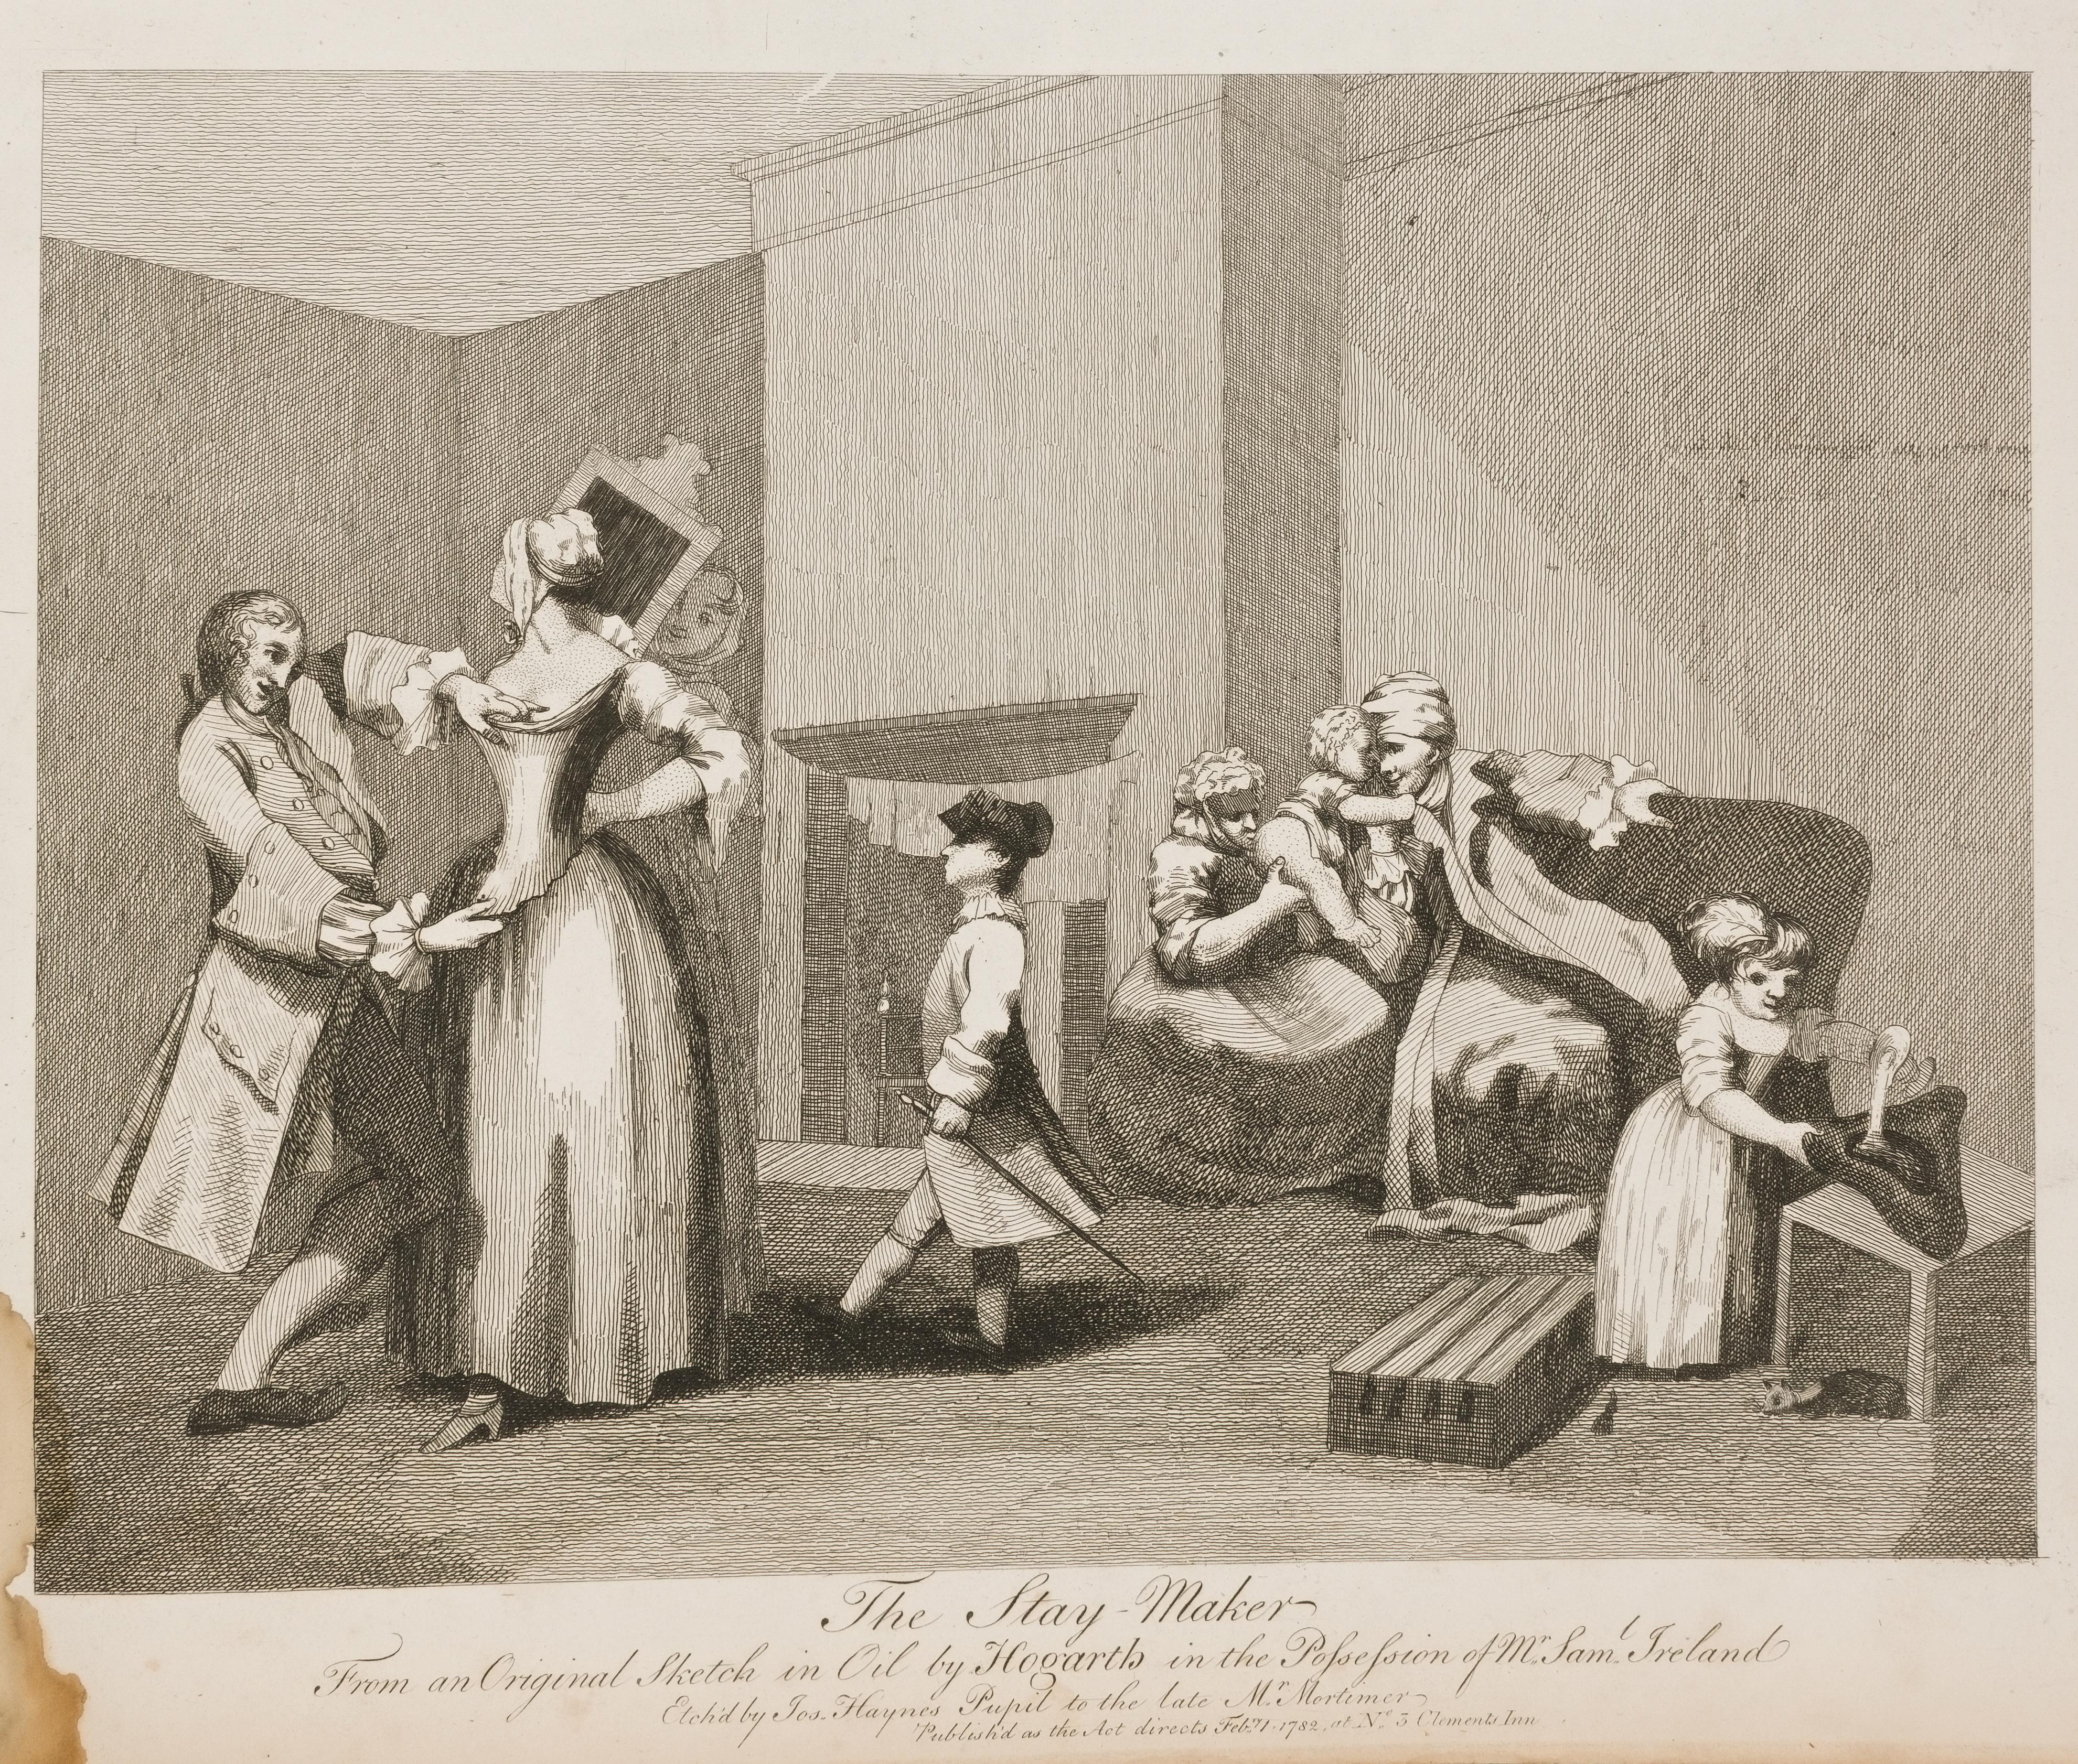 William Hogarth - The Stay Maker